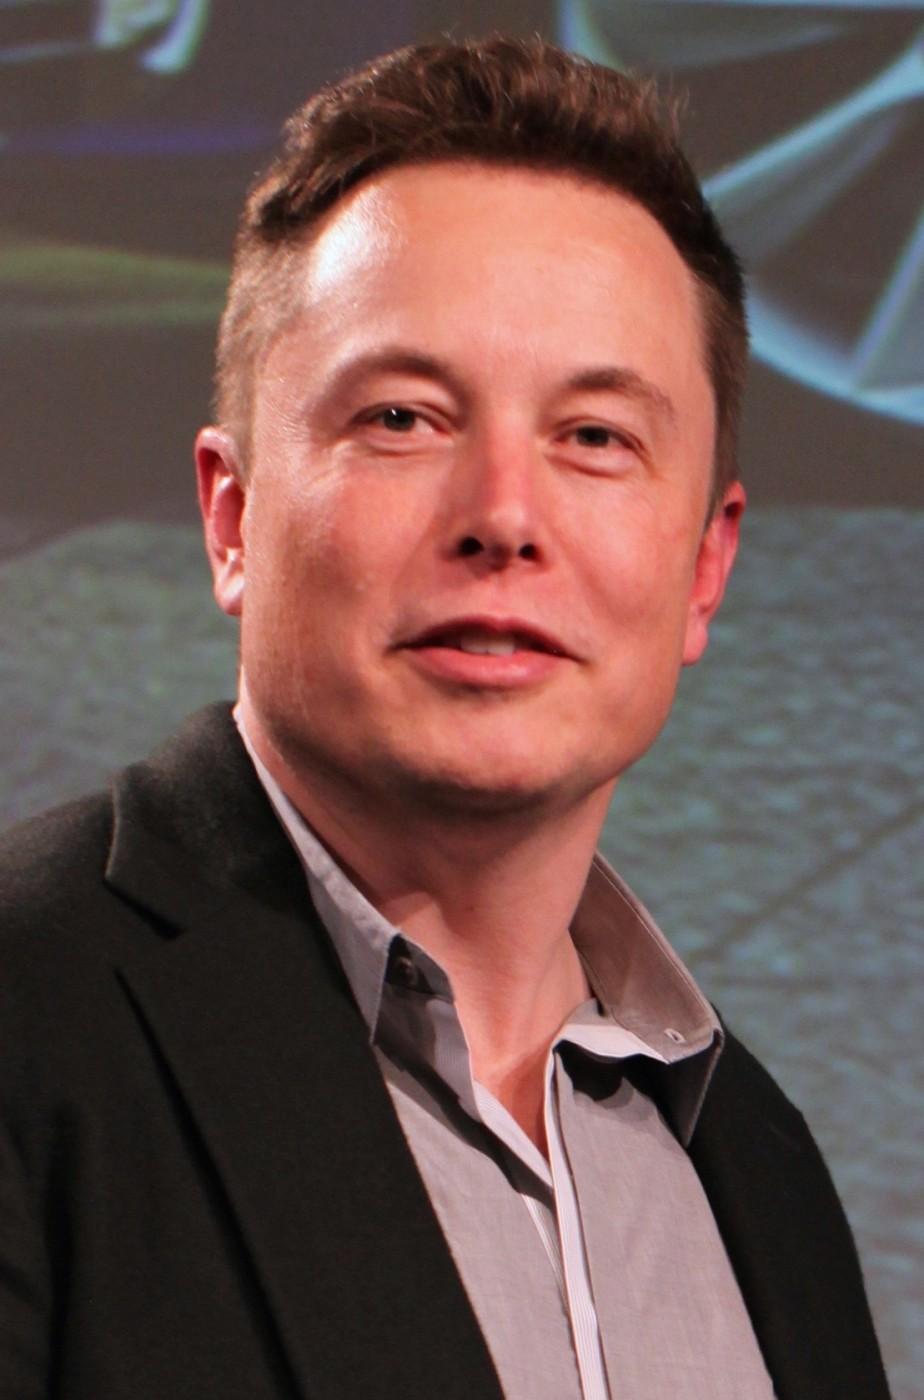 Elon_Musk_2015 by Steve Jurveson